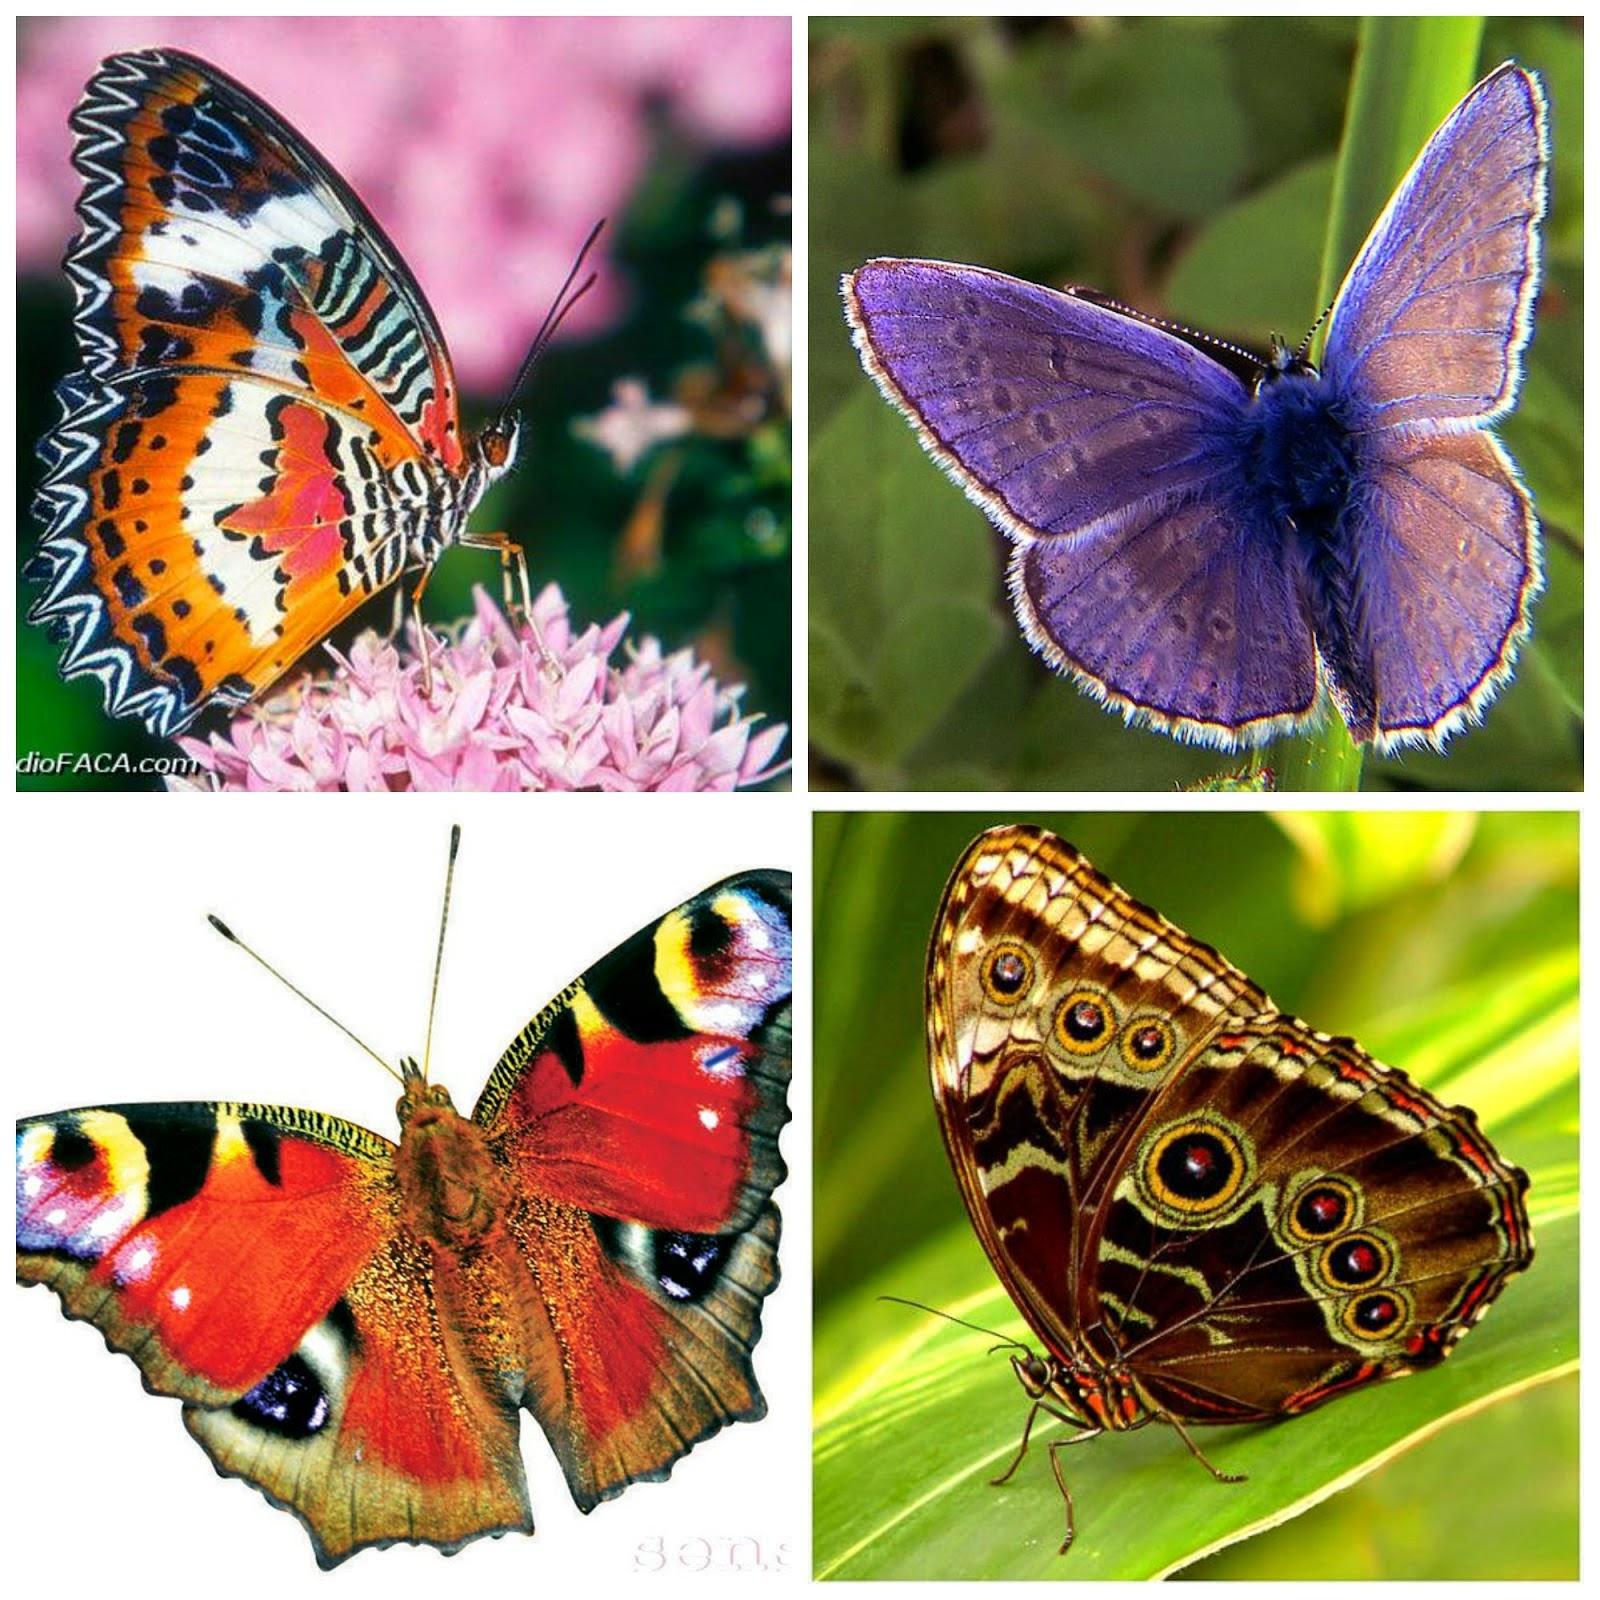 Alenka's Butterfly BH